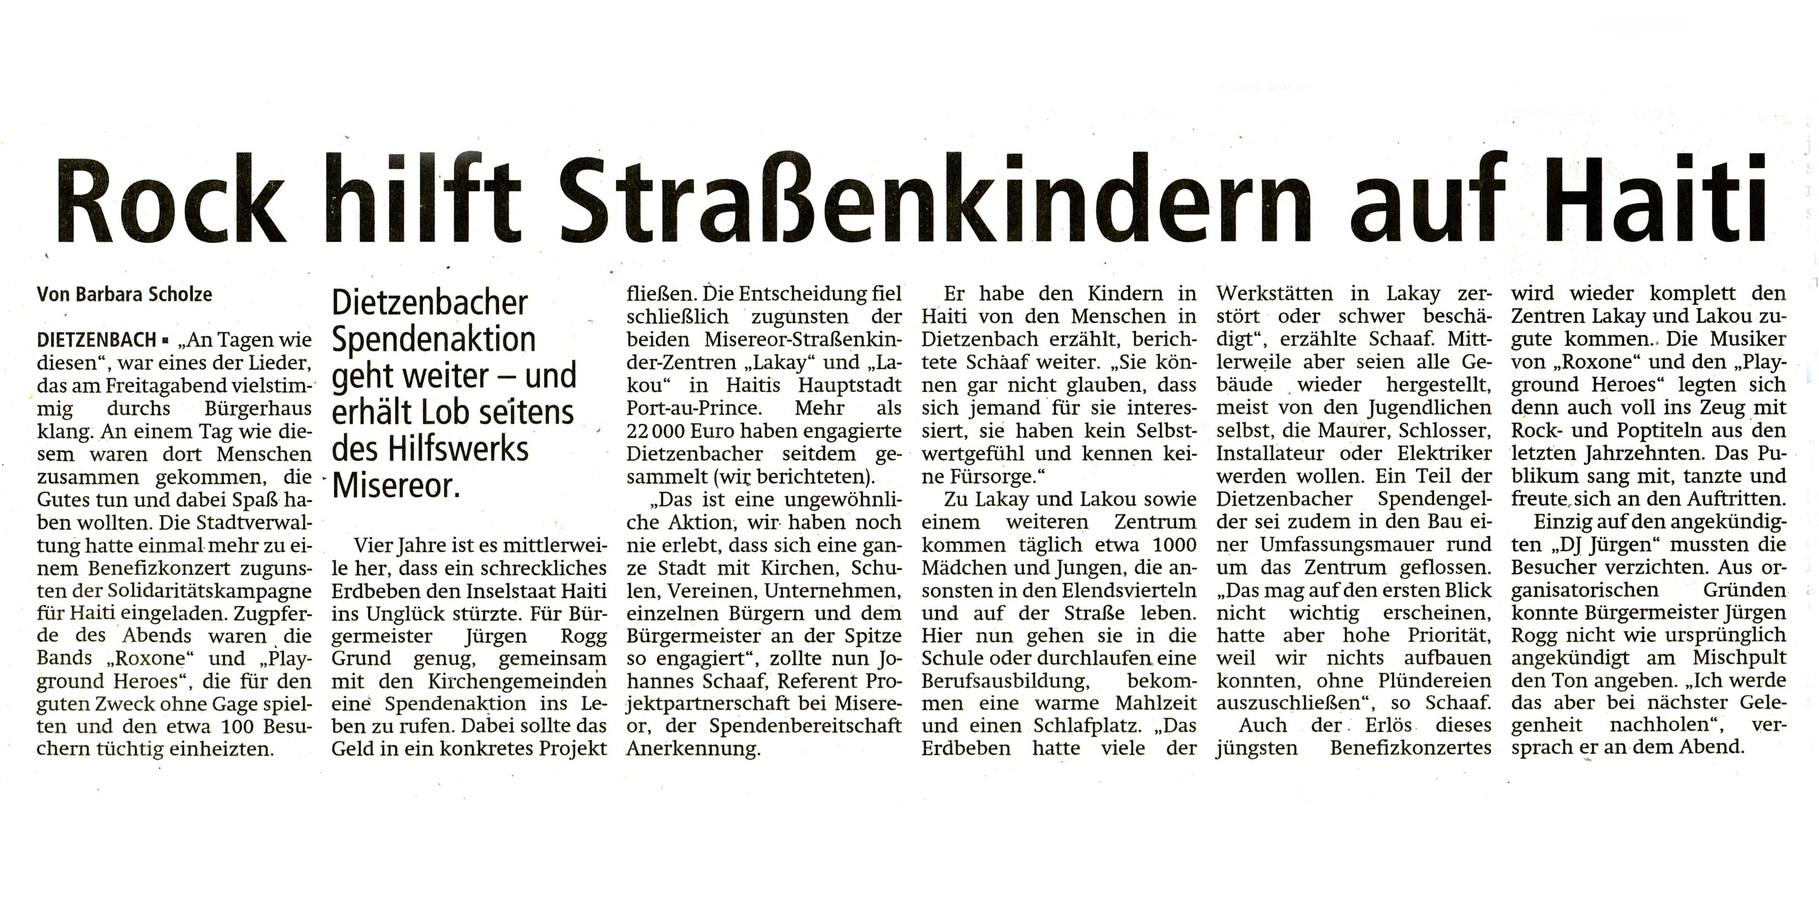 Offenbach Post, 24. Februar 2014